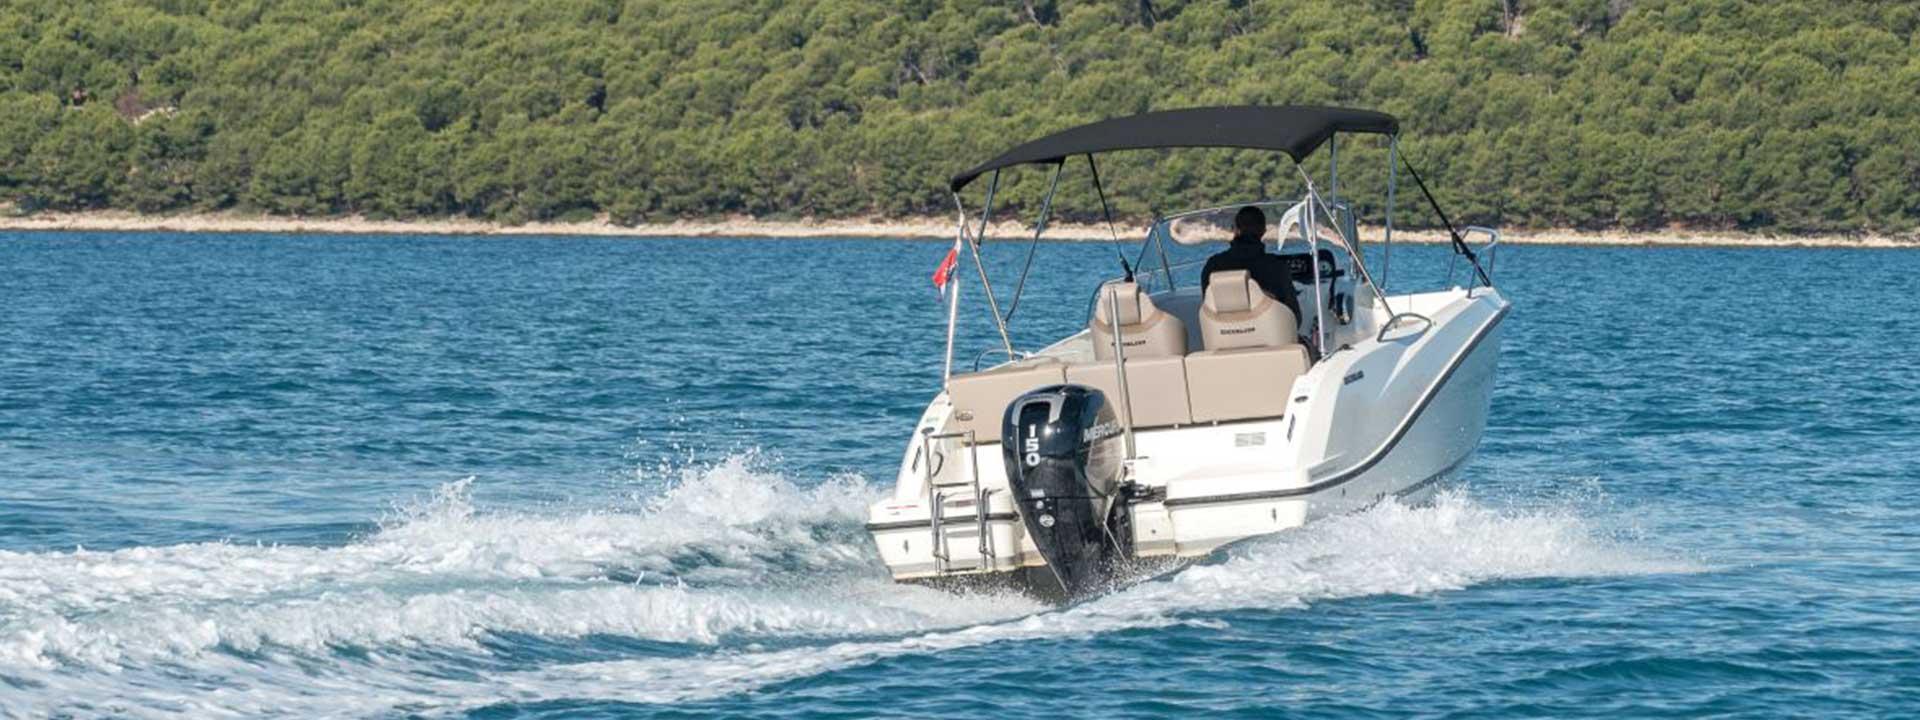 mayer-charter-boat-header-quicksilver-activ-675-open-02